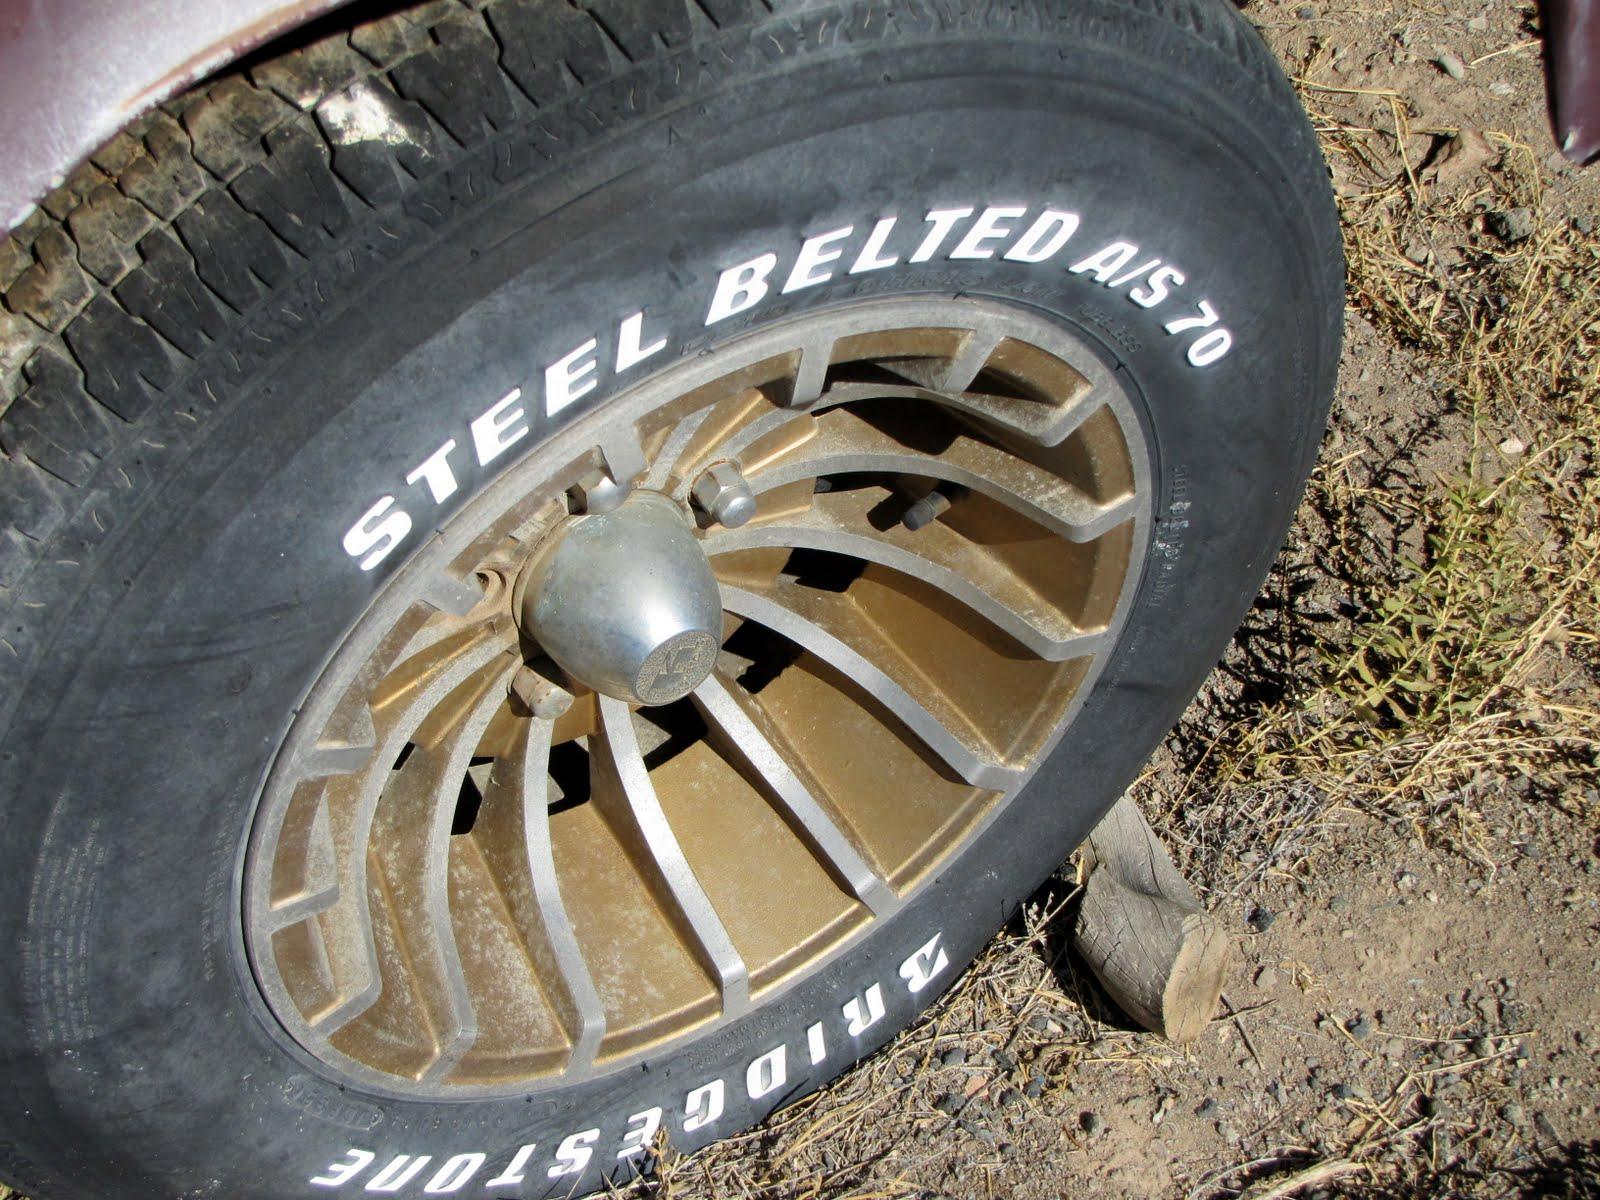 Steel Belted tire